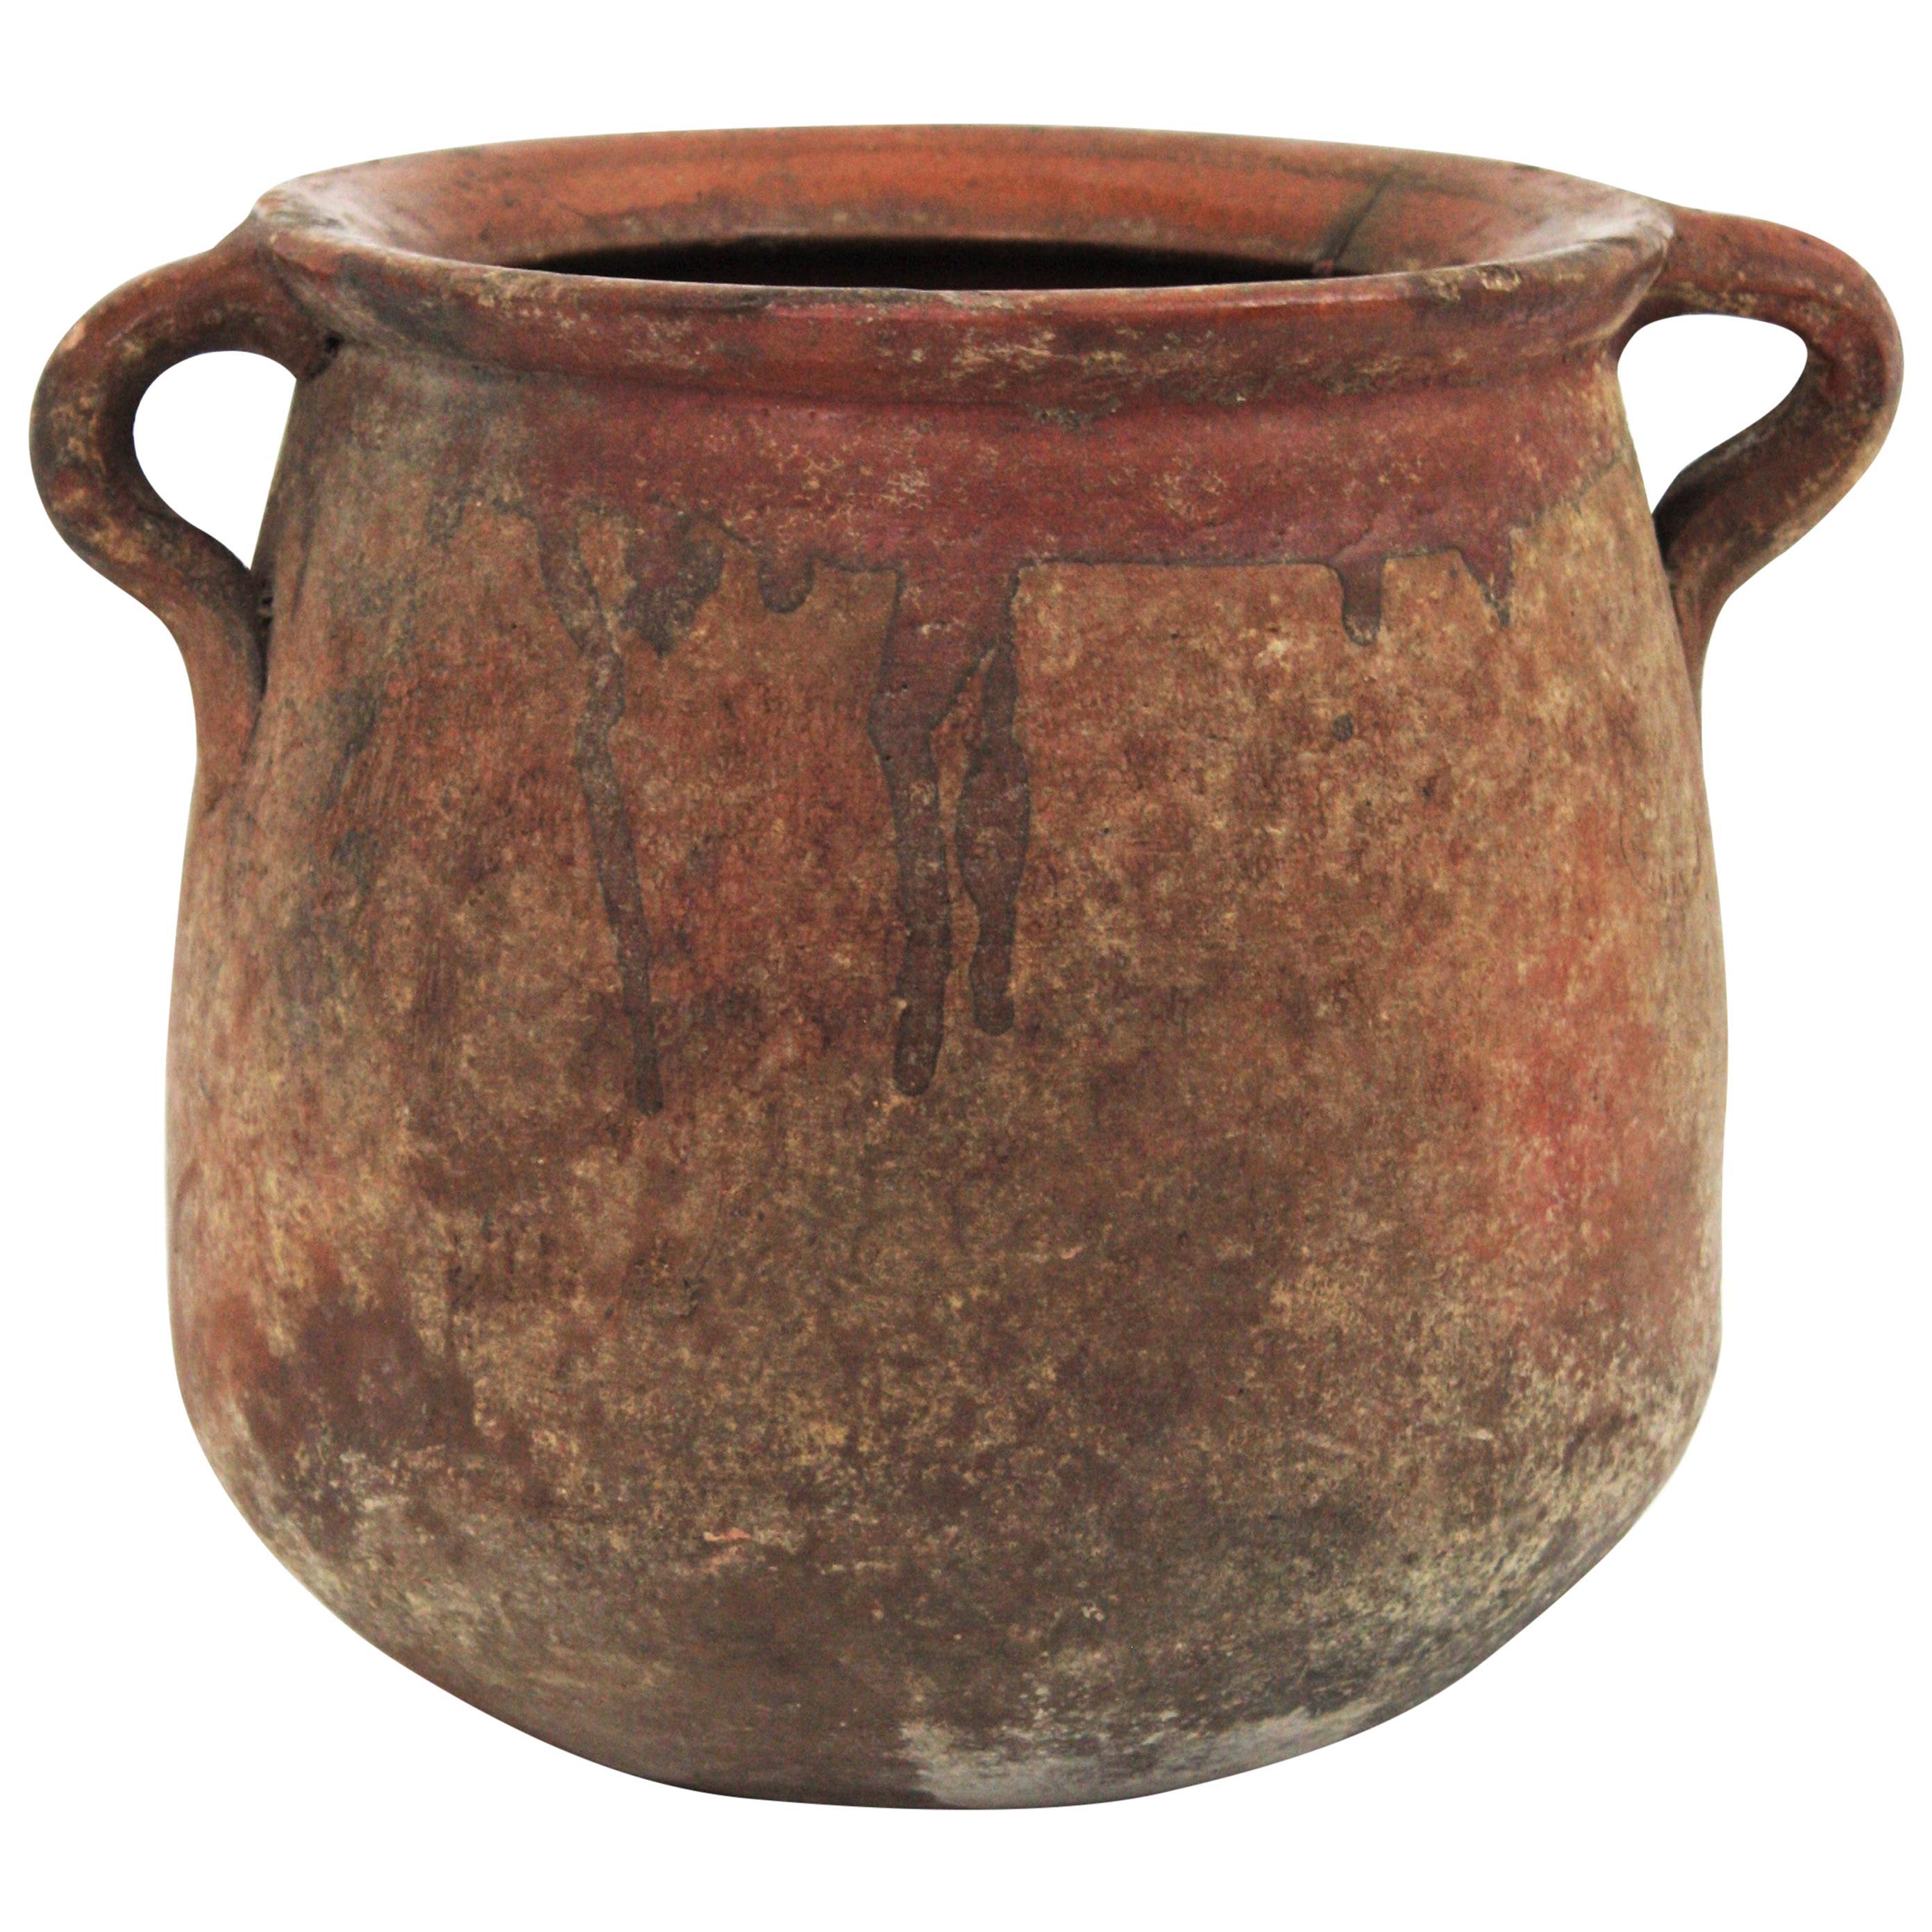 Spanish Unglazed Terracotta Pot or Vessel, 19th Century